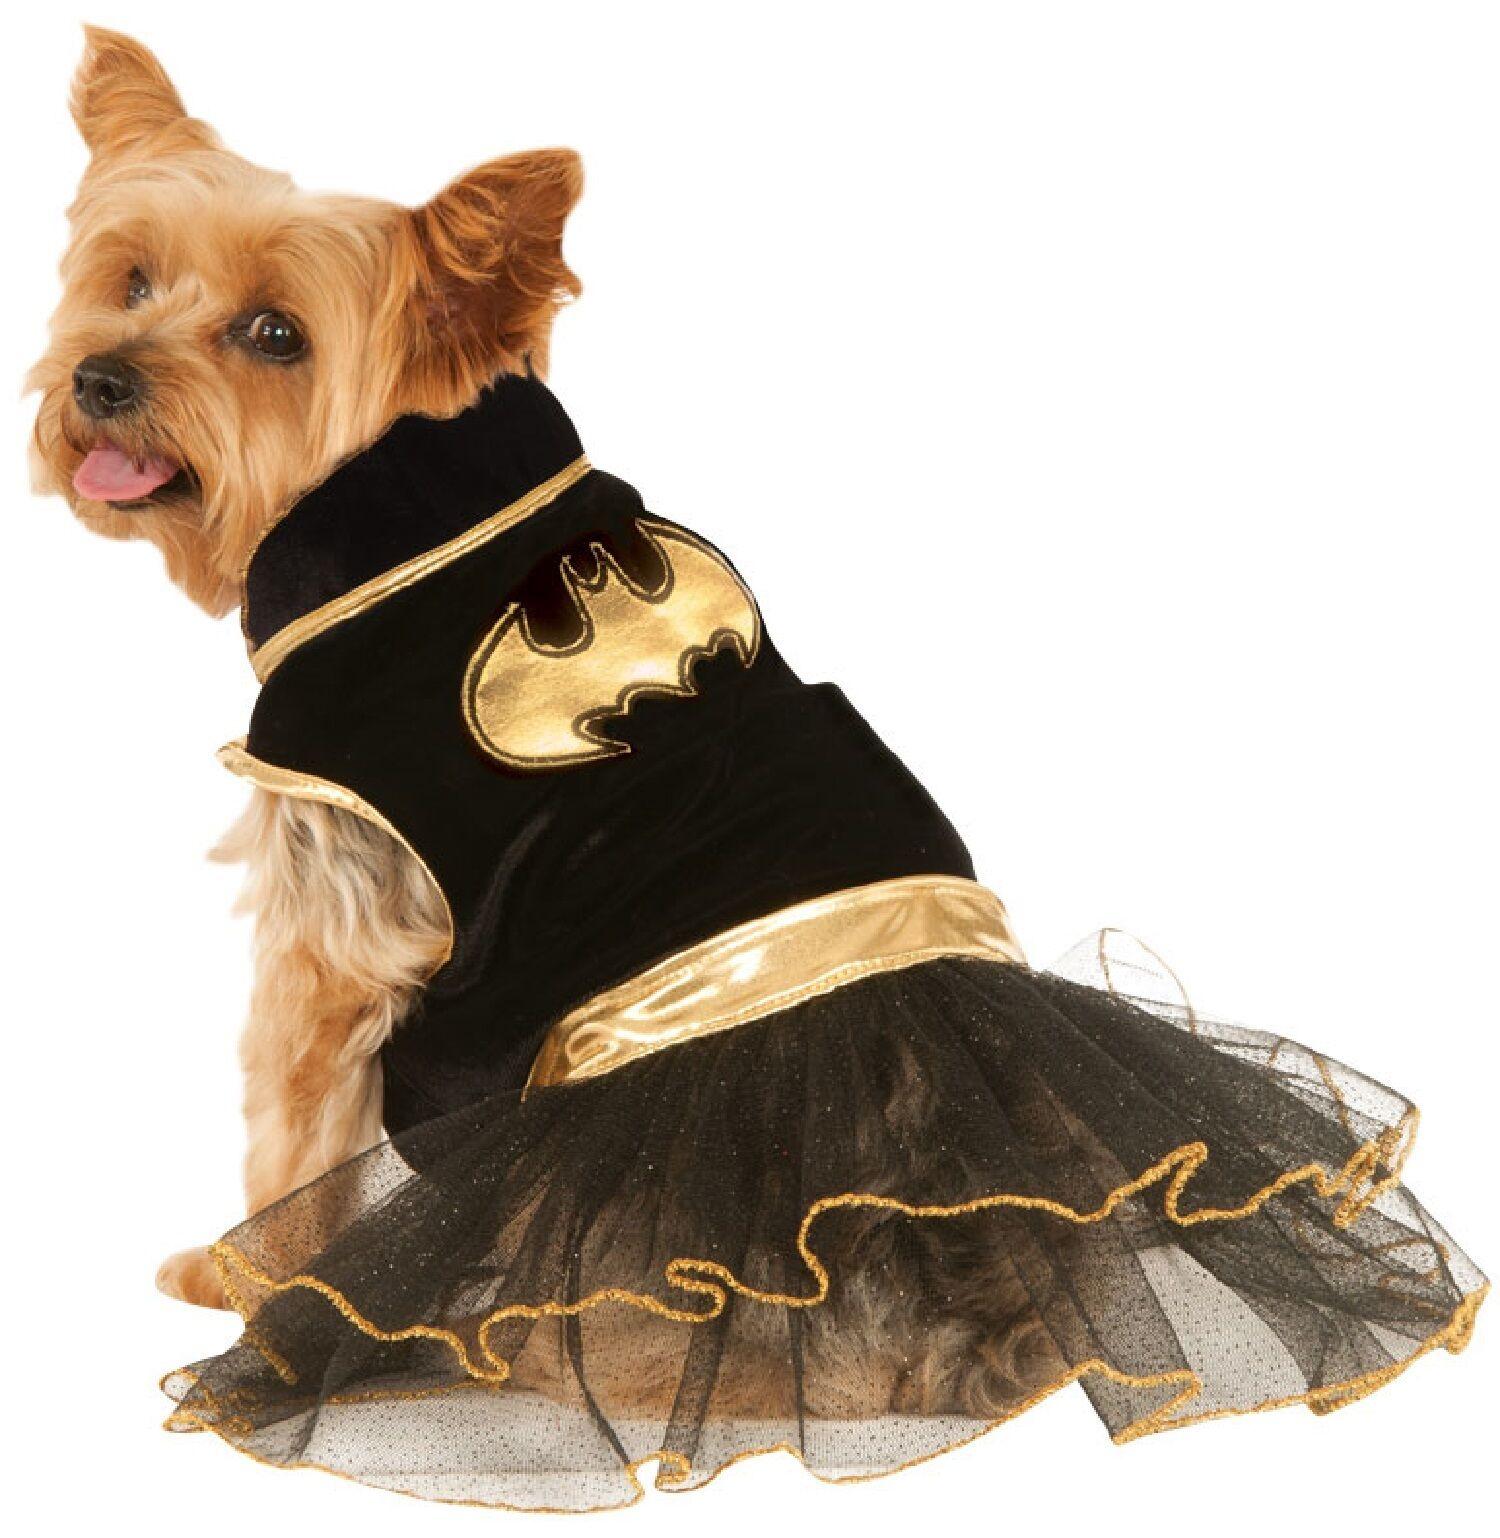 Haustier Hund Katze Batgirl Batman Superheld Halloween Kostüm Outfit Outfit Outfit Verkleidung  | Ausgezeichnetes Handwerk  842dd2